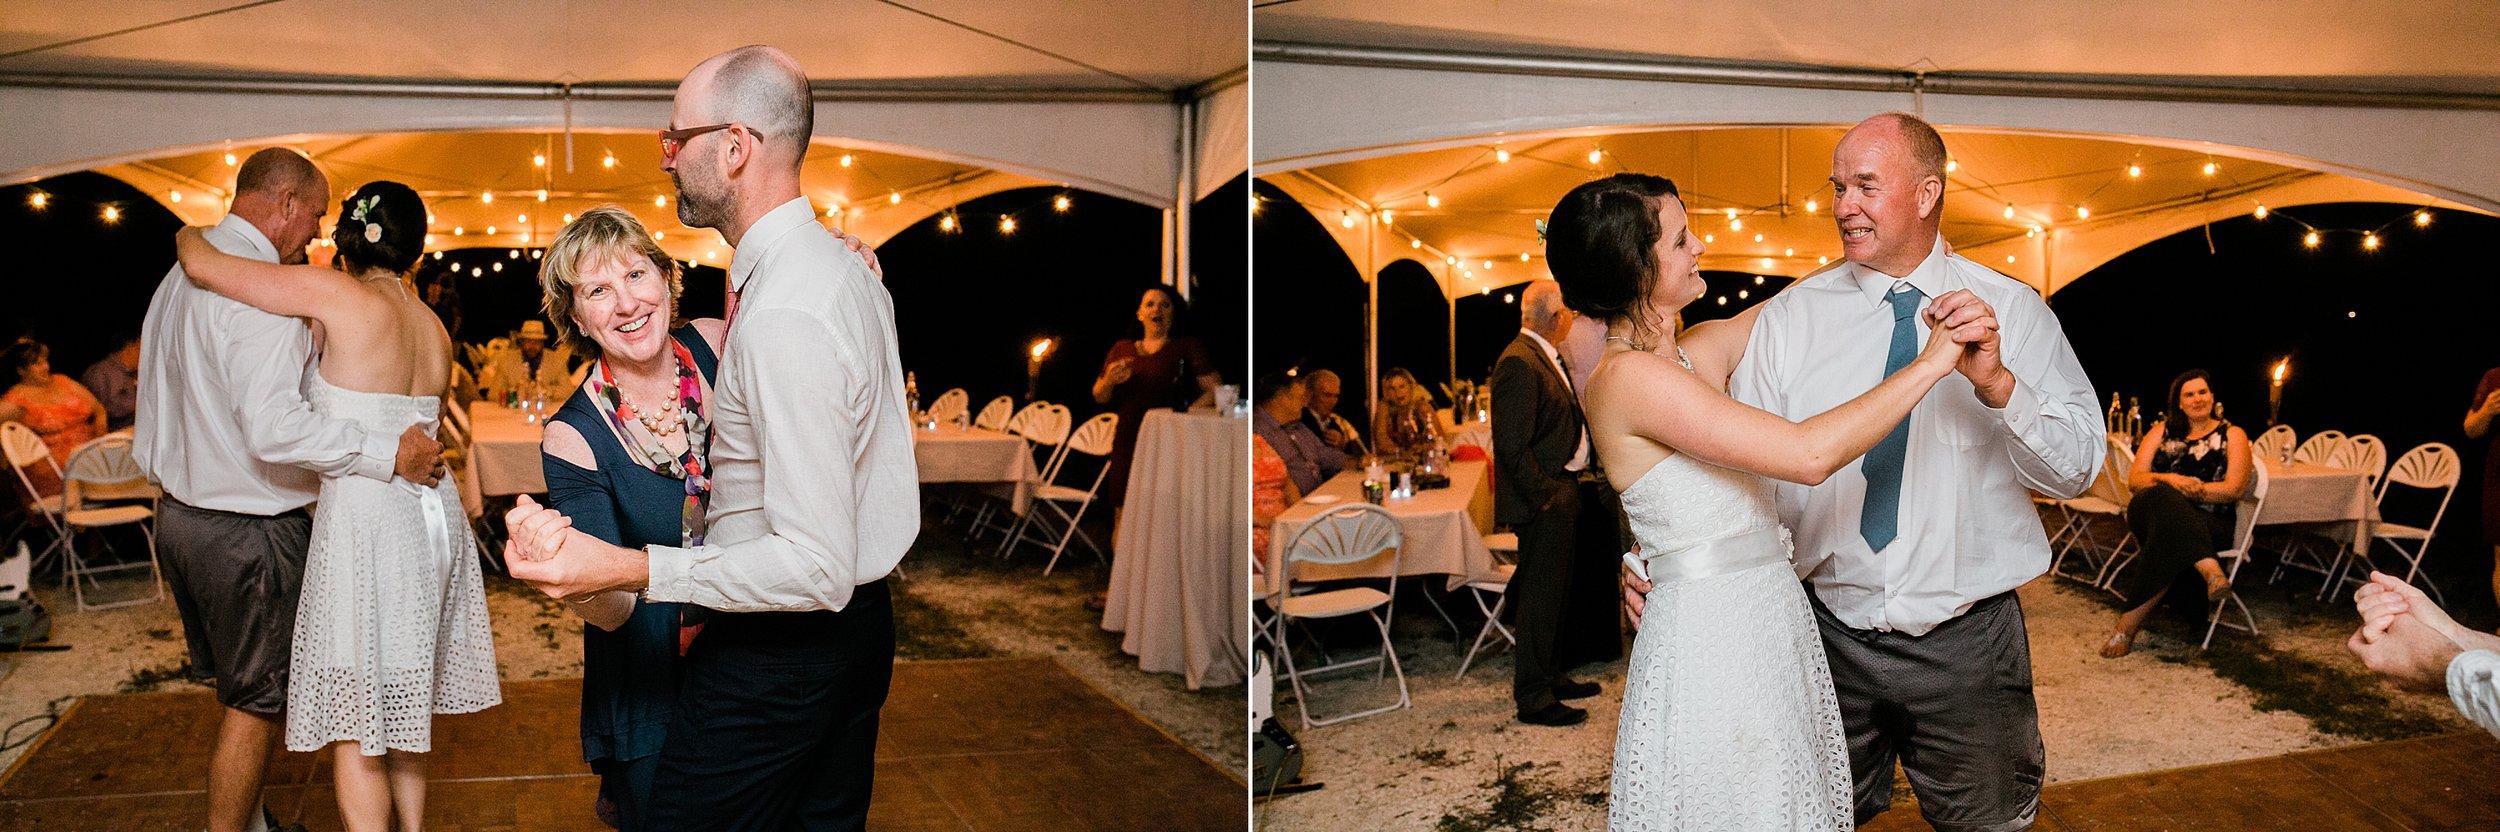 106 los angeles wedding photographer.jpg